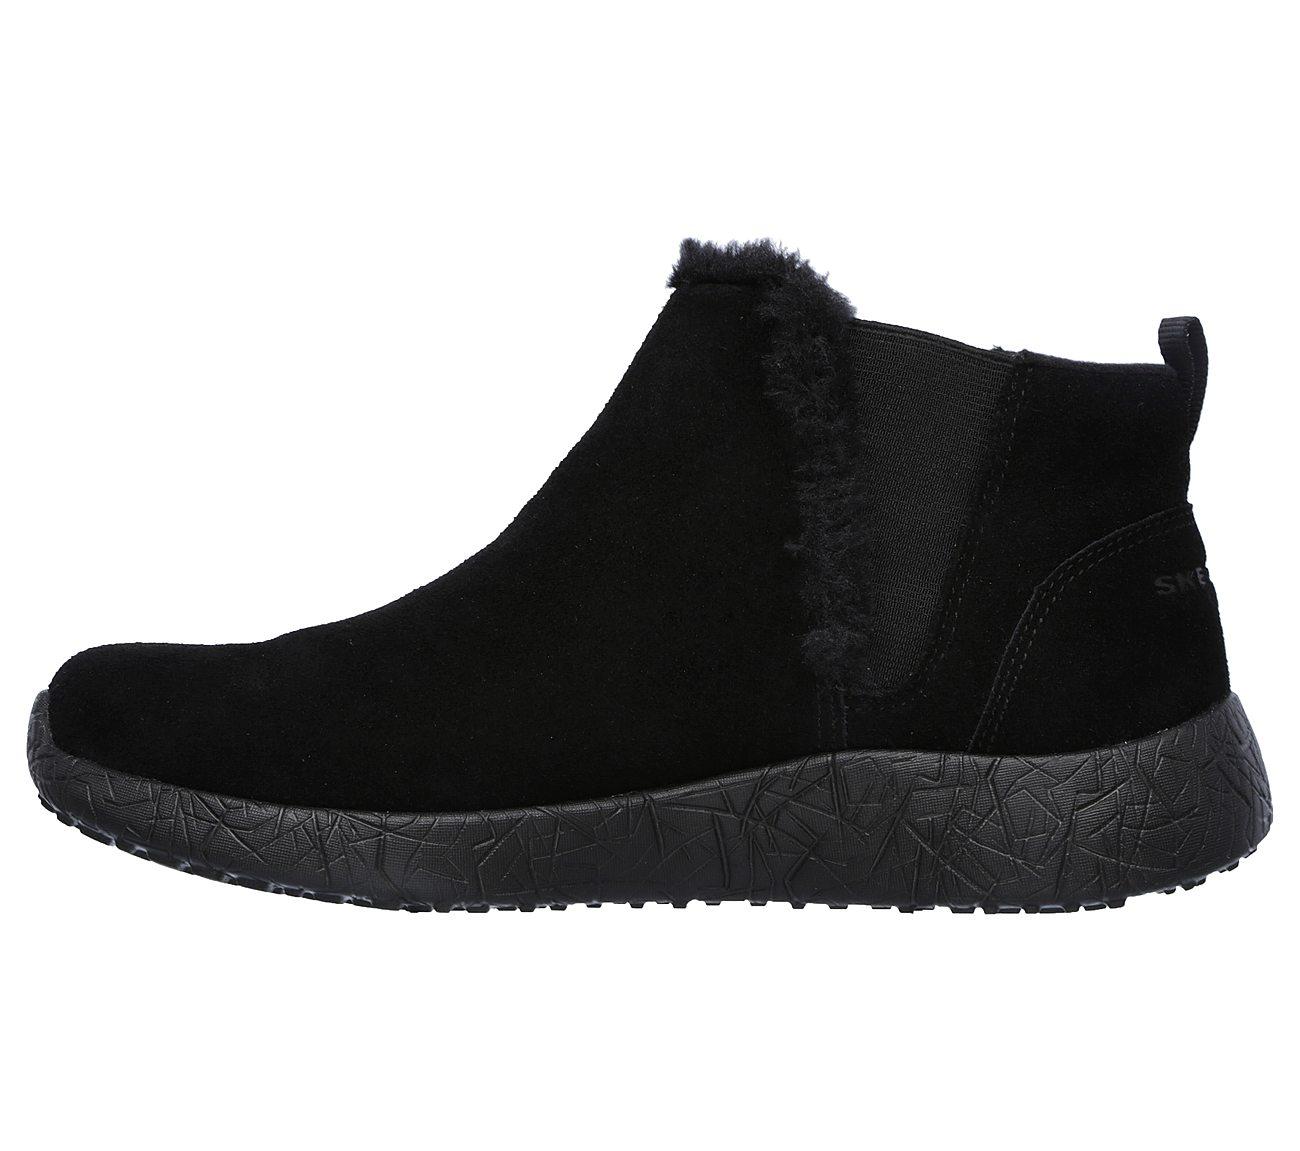 skechers sport burst-winter lights women's boot